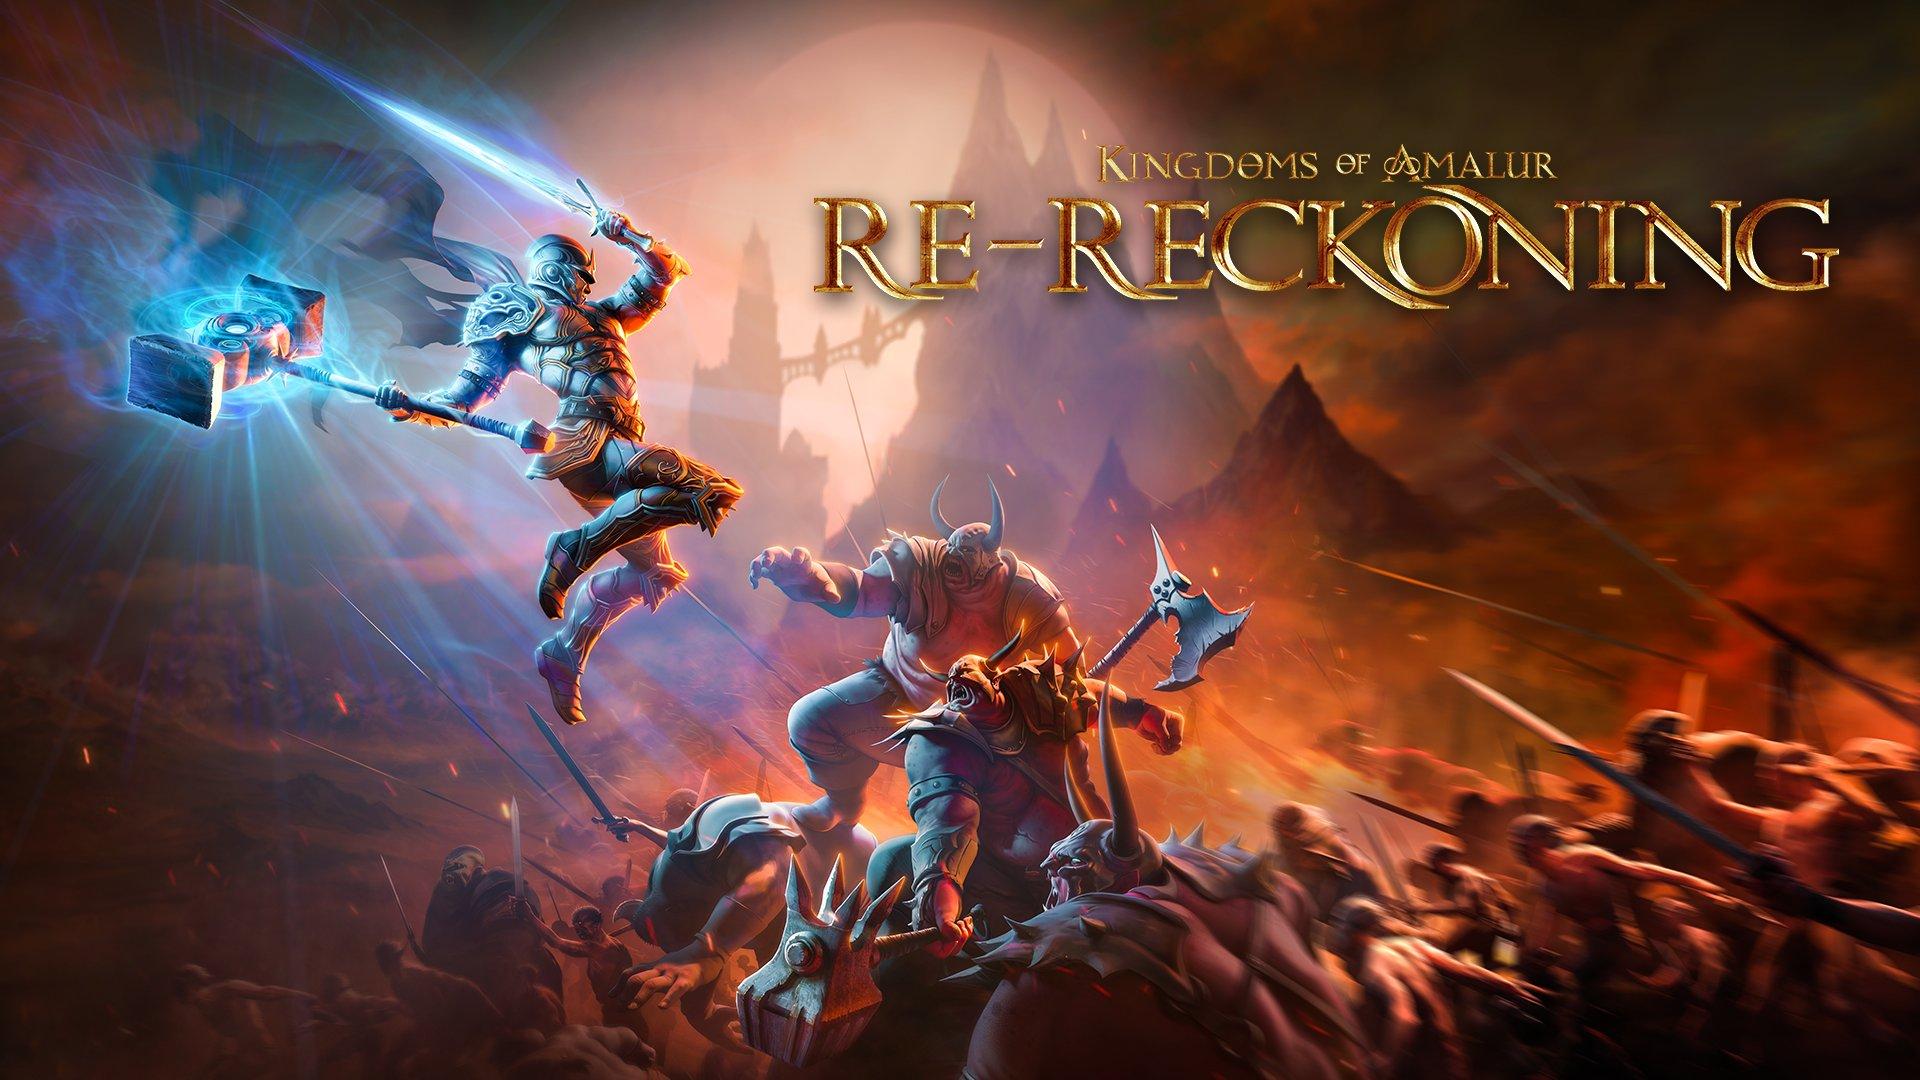 Kingdoms of Amalur Re-Reckoning Featured Image